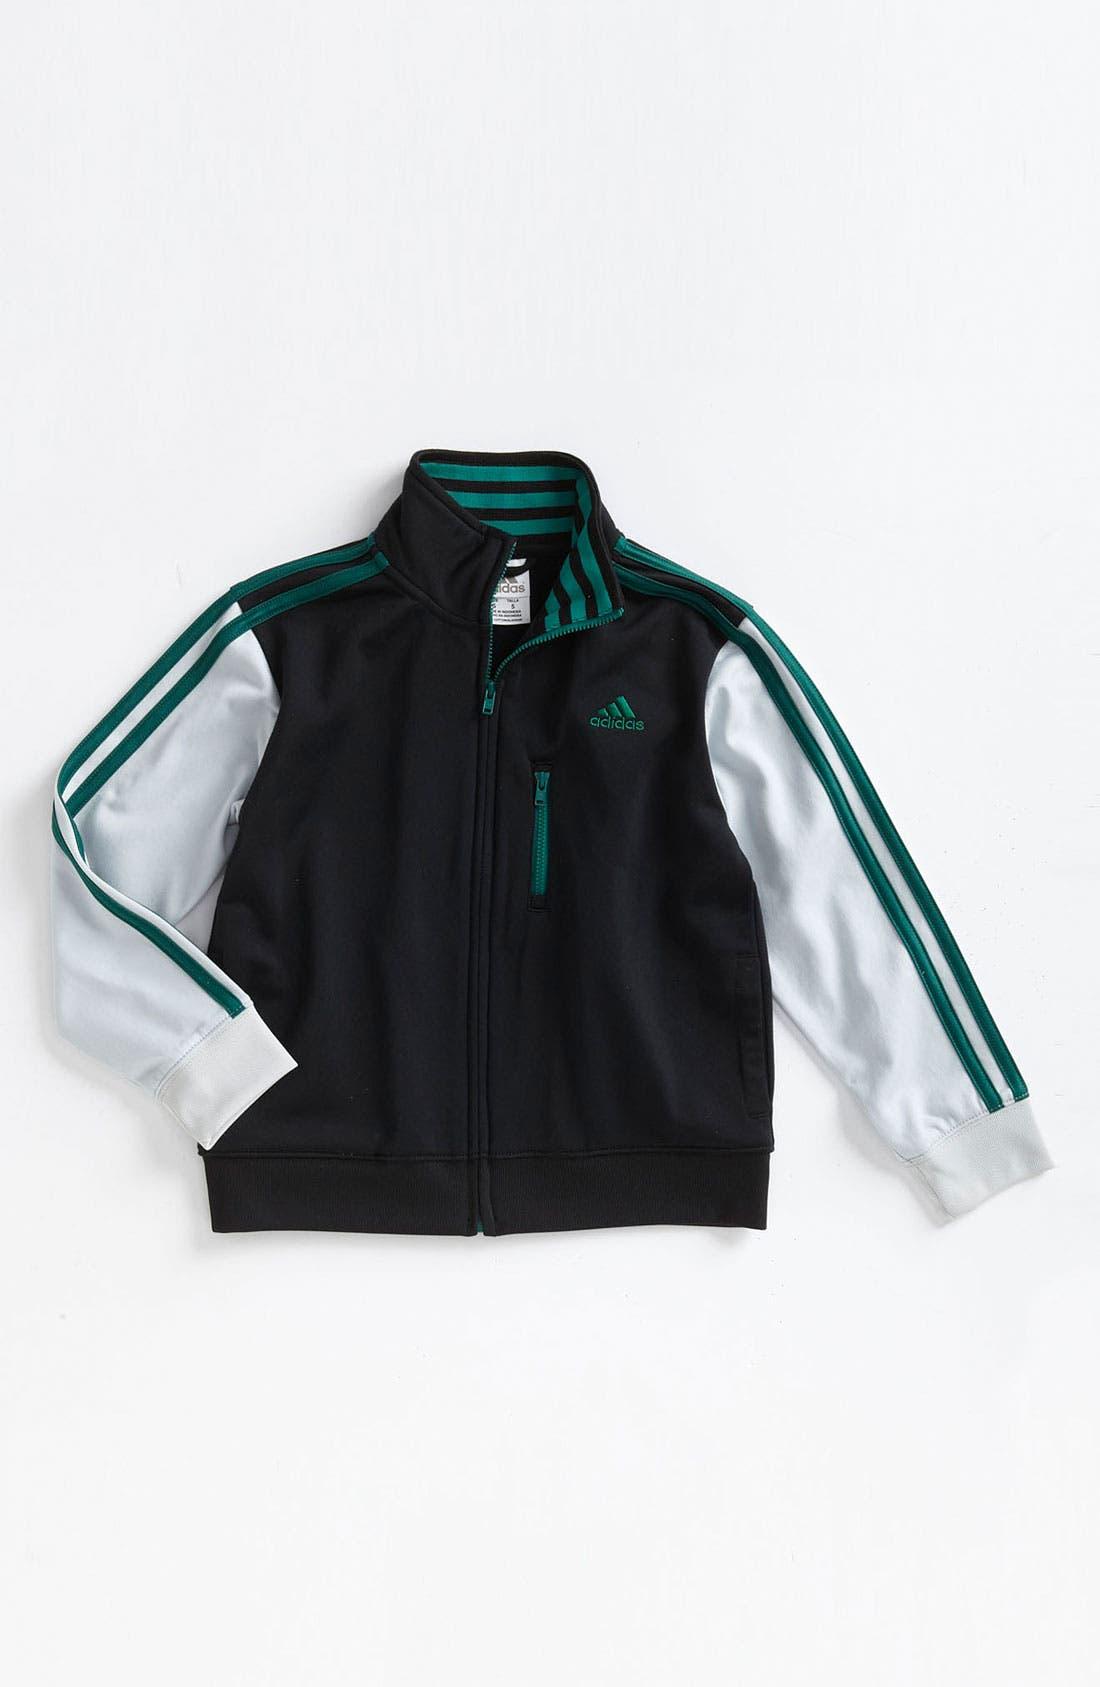 Alternate Image 1 Selected - adidas 'Varsity' Jacket (Little Boys)